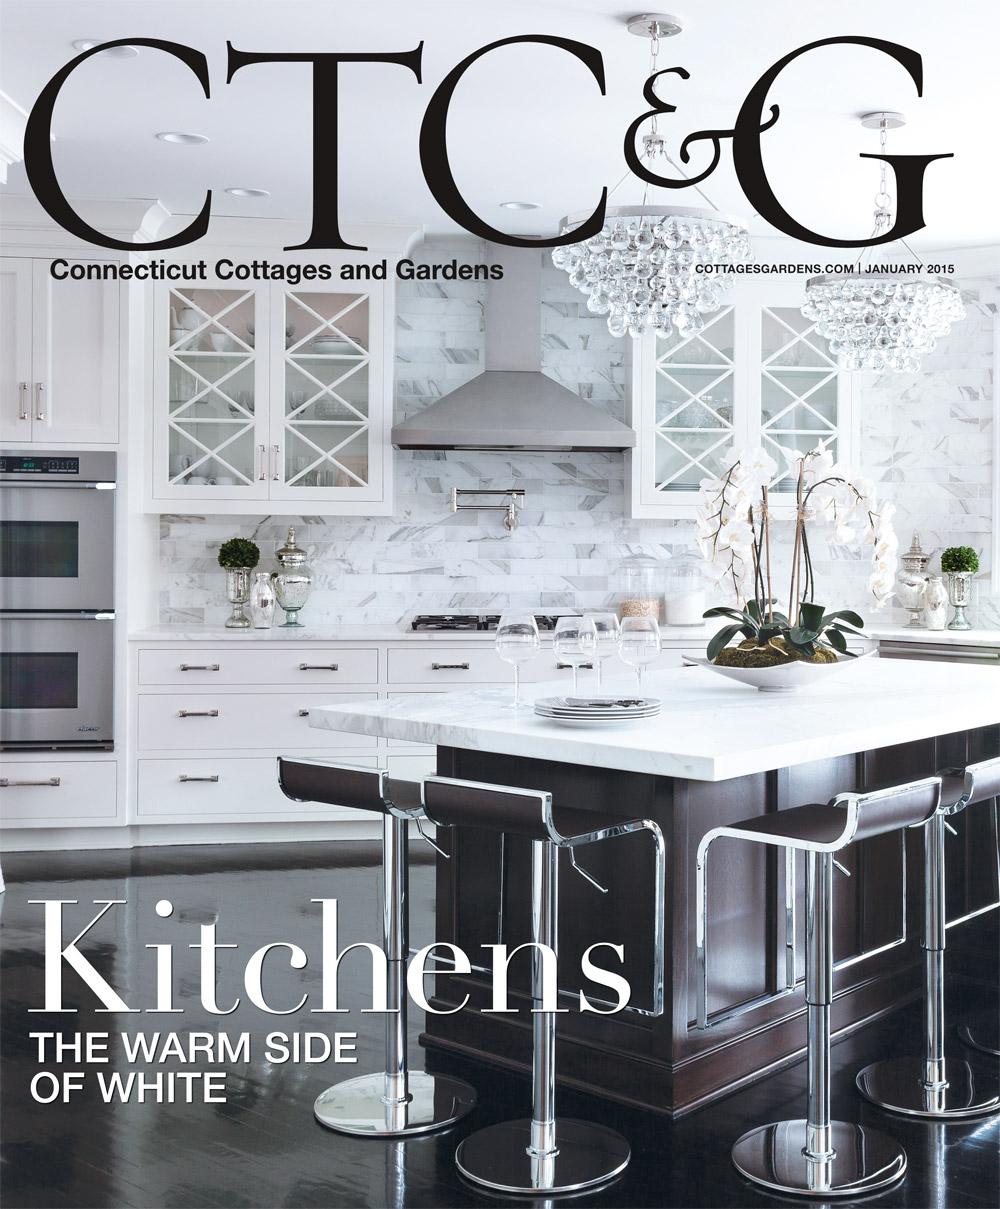 January-2015-Cover-CTCG.jpg